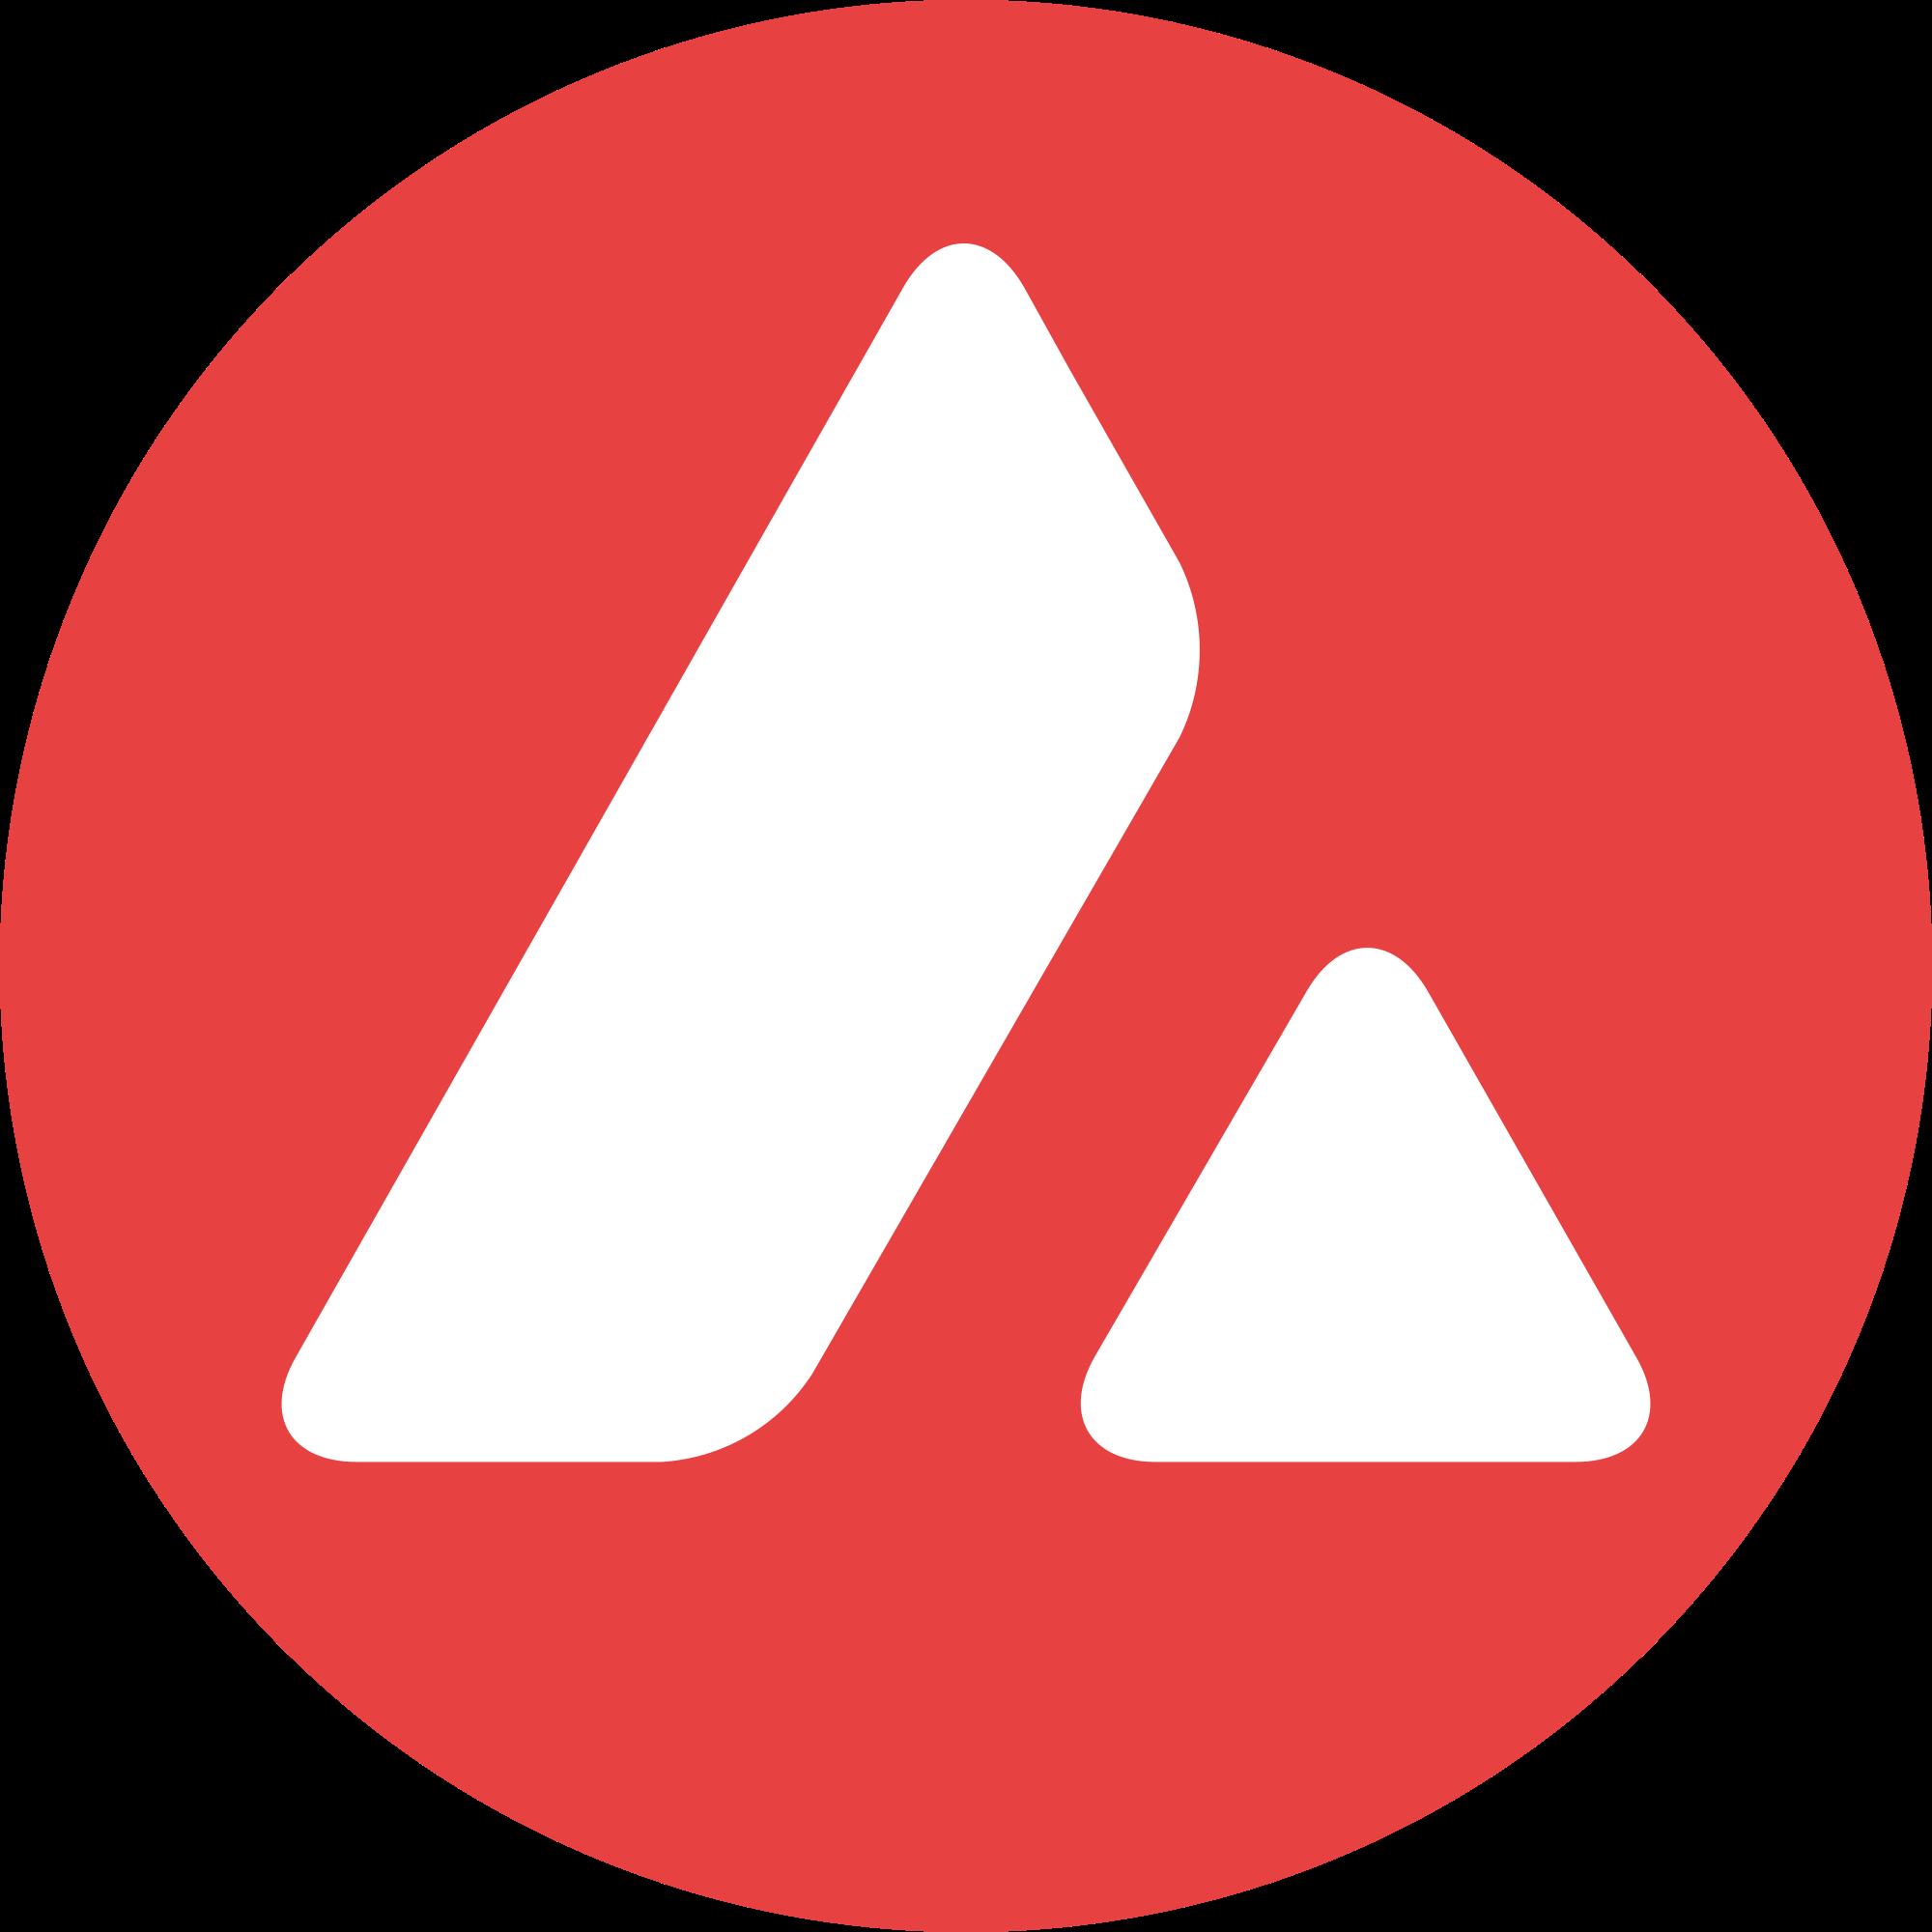 ava-labs